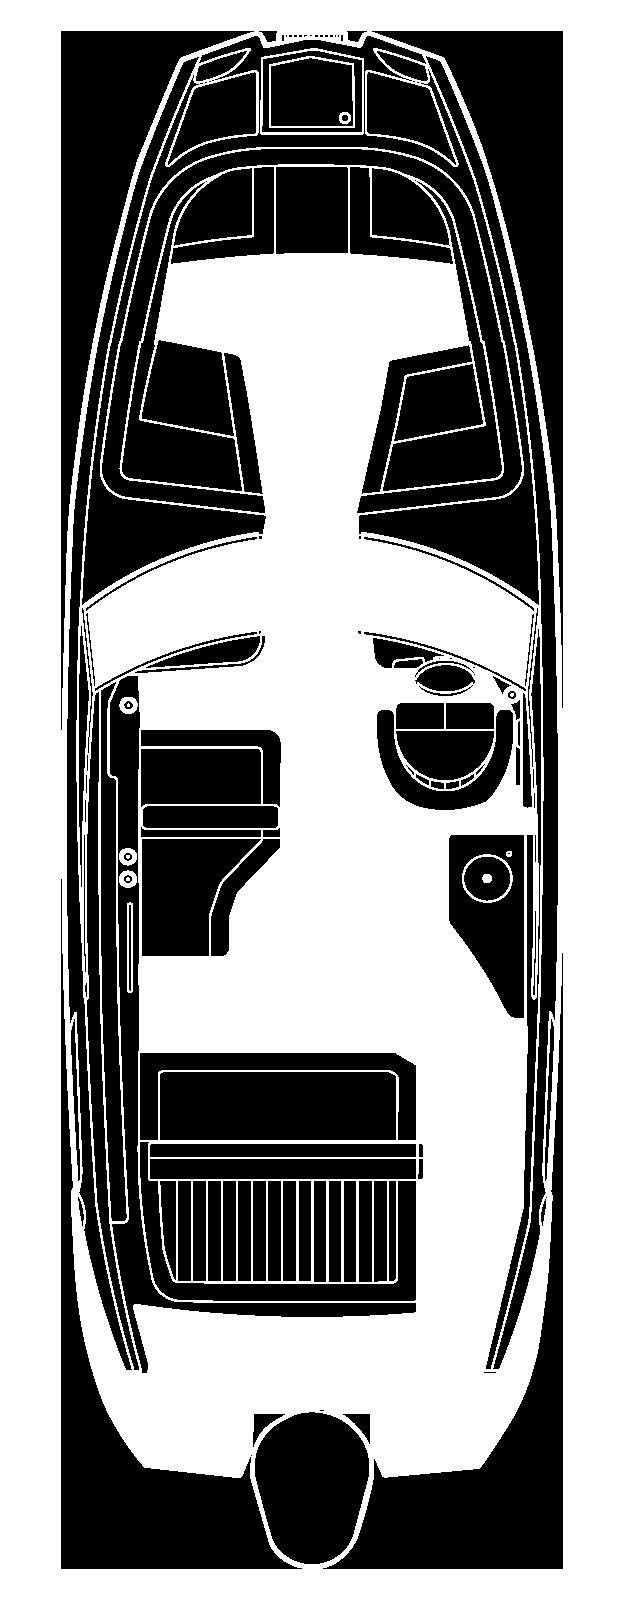 23SC_CobaltBoats_Floorplans